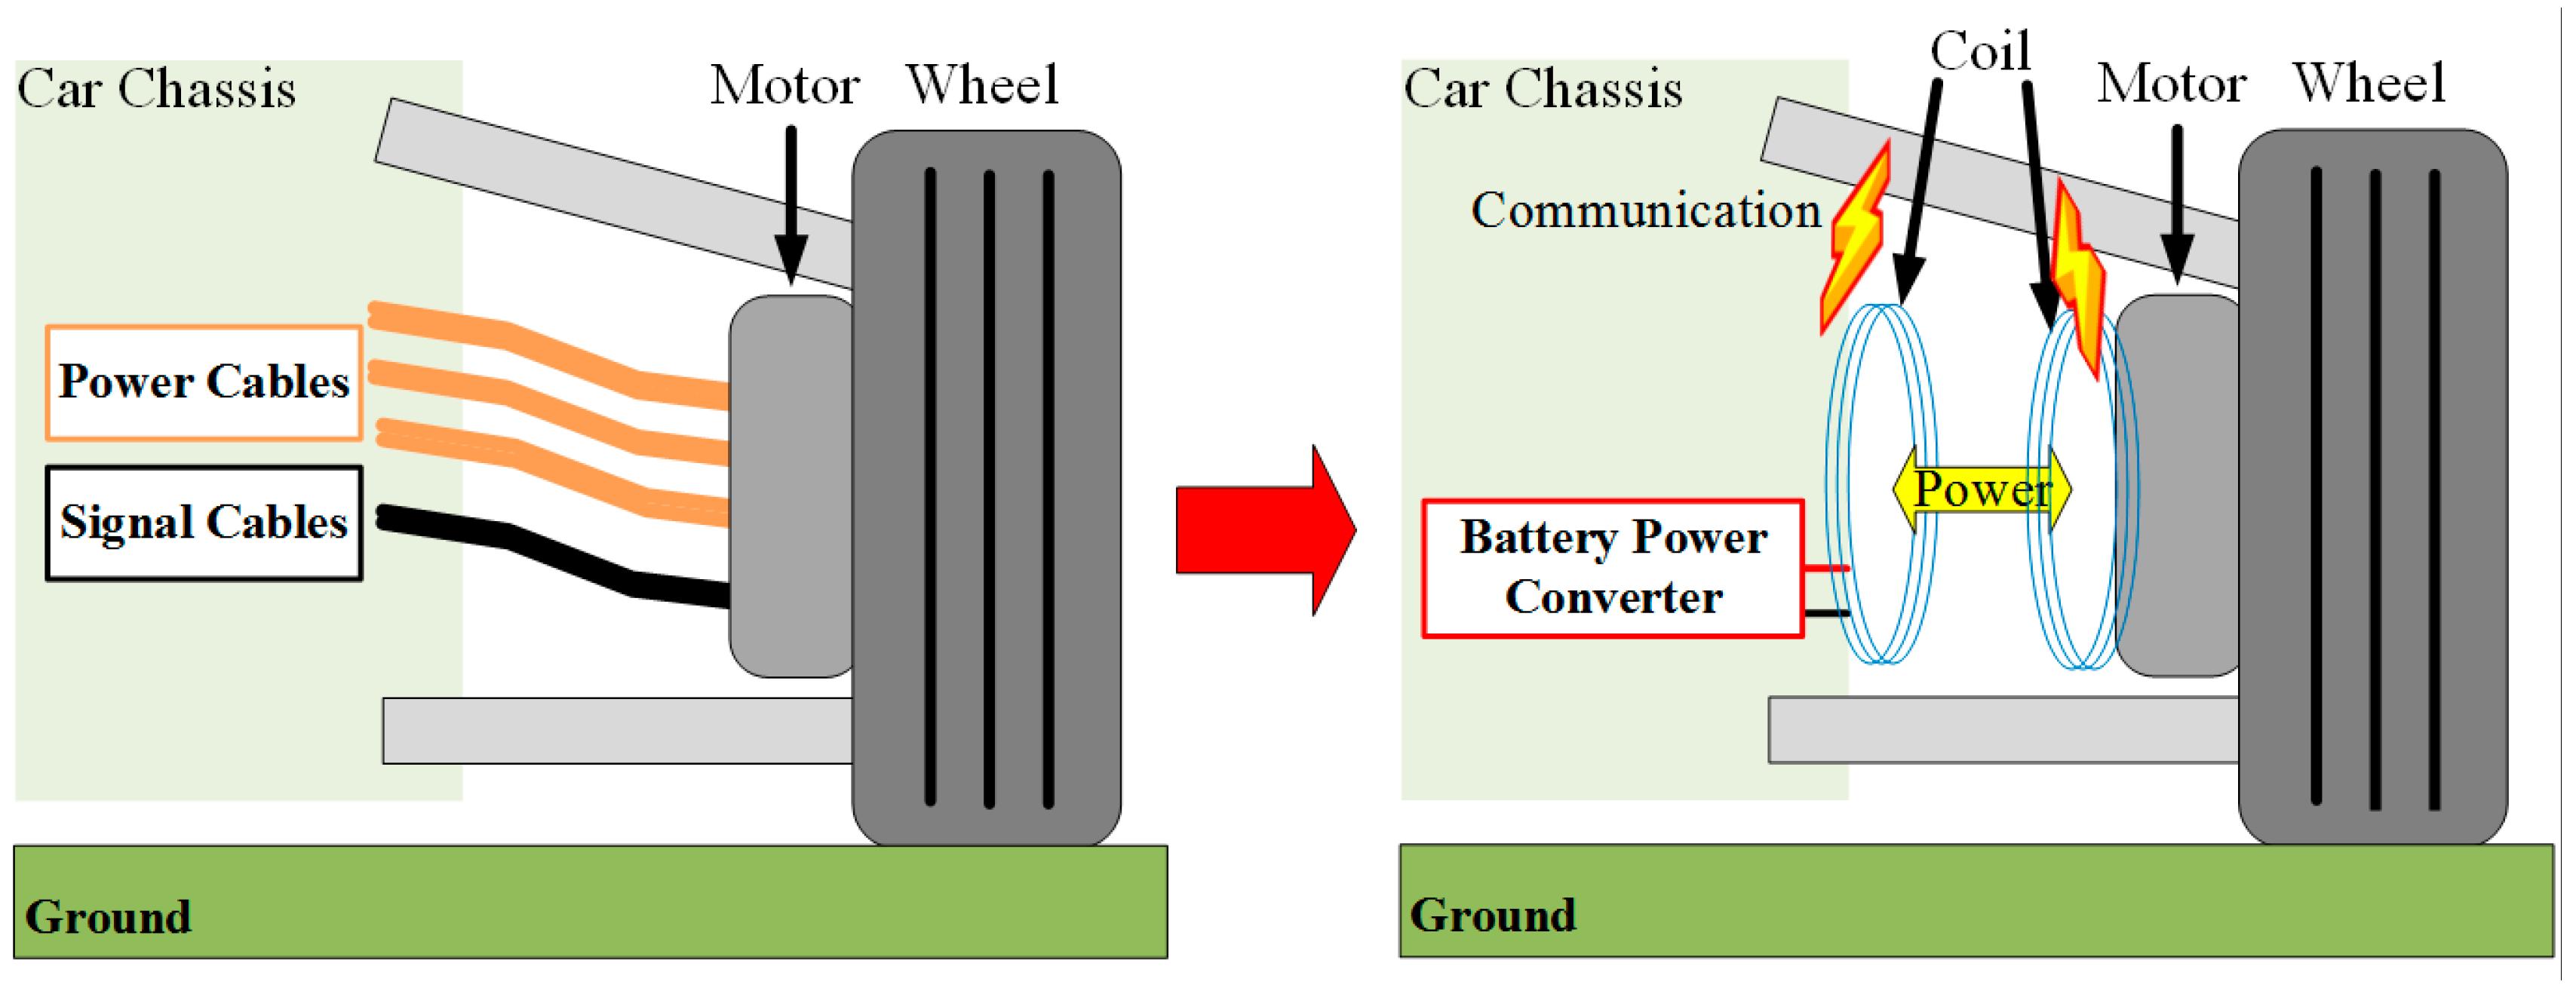 Transit C Er Conversion On Plug Wiring Diagram For Laptop Charger